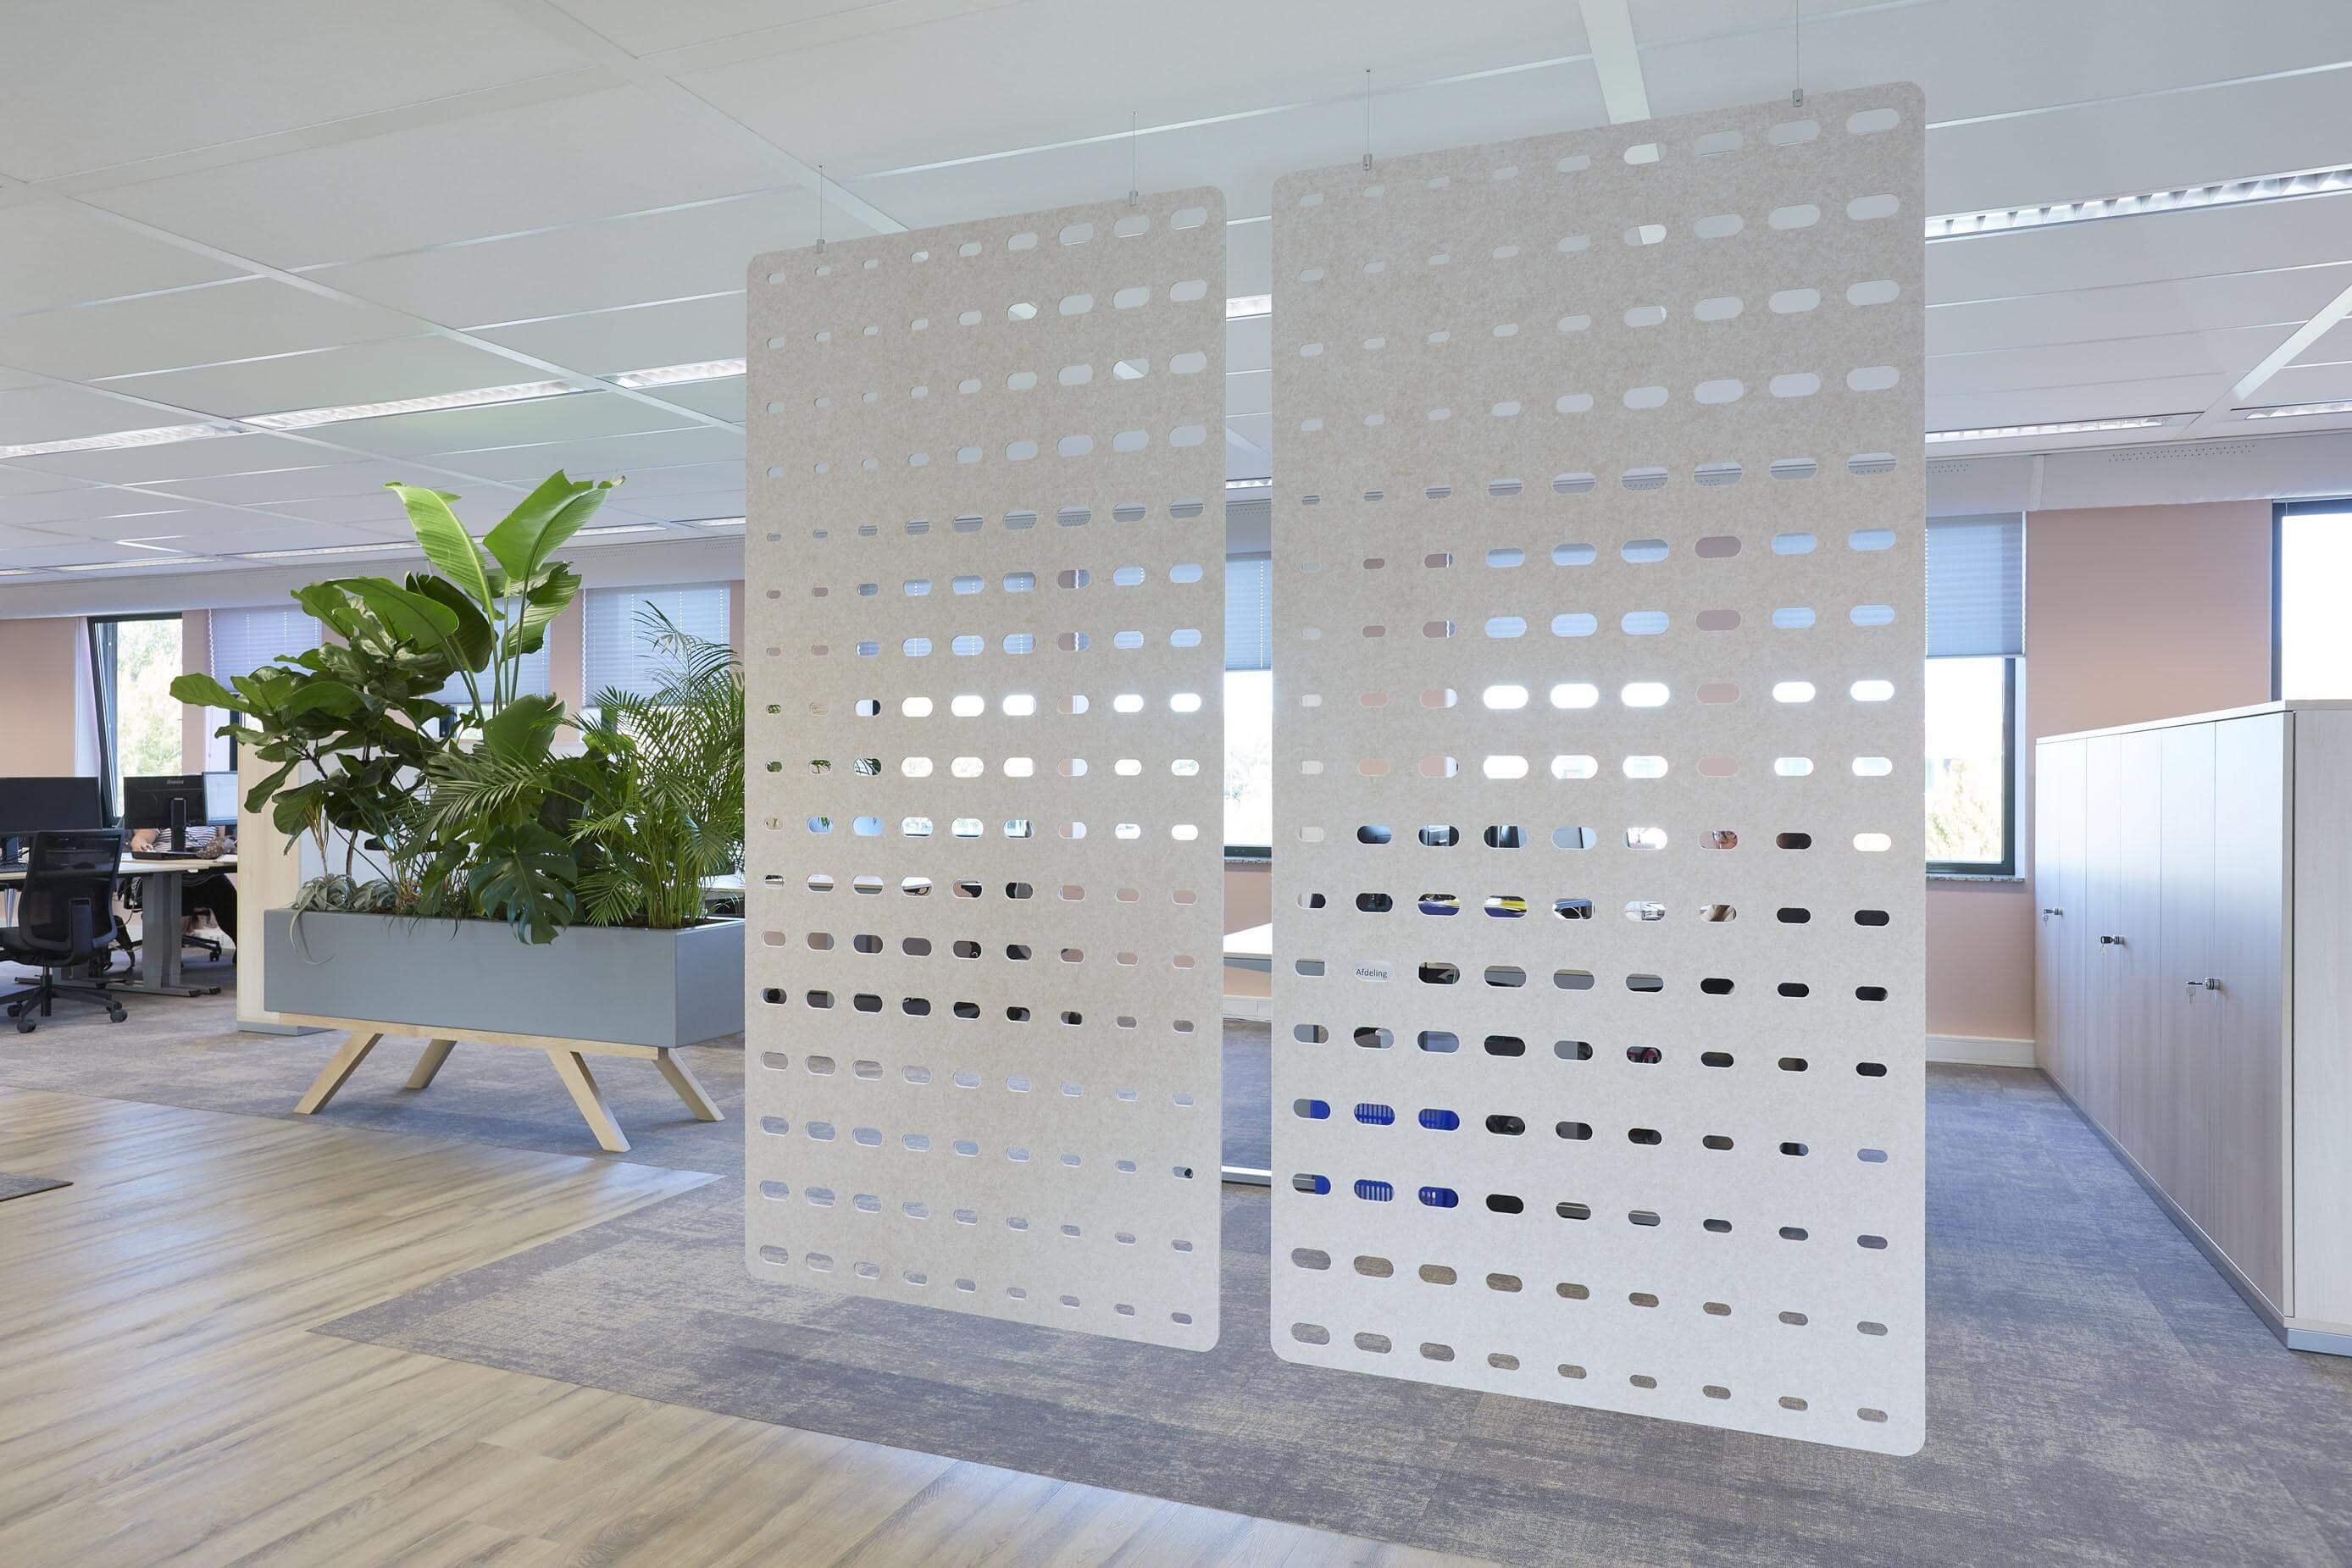 Enver, Mixus studio, petflet patronen